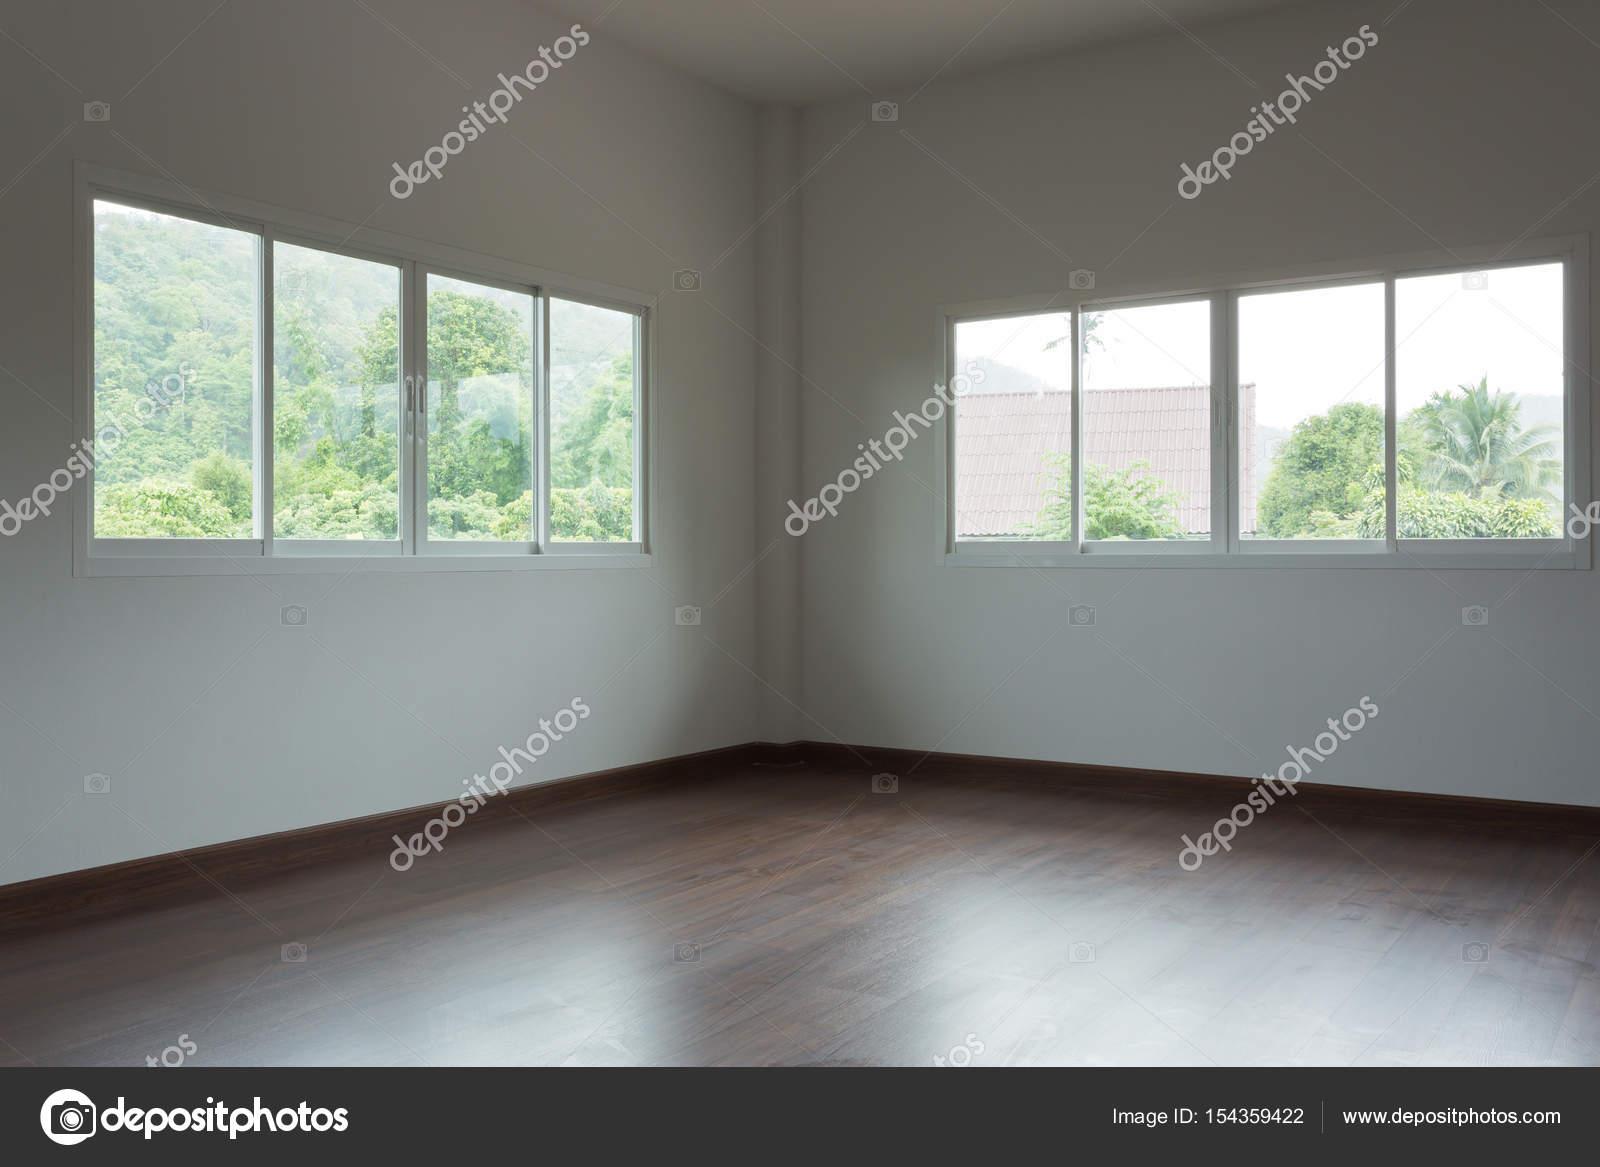 leeren Raum Innenarchitektur — Stockfoto © Sutichak #154359422